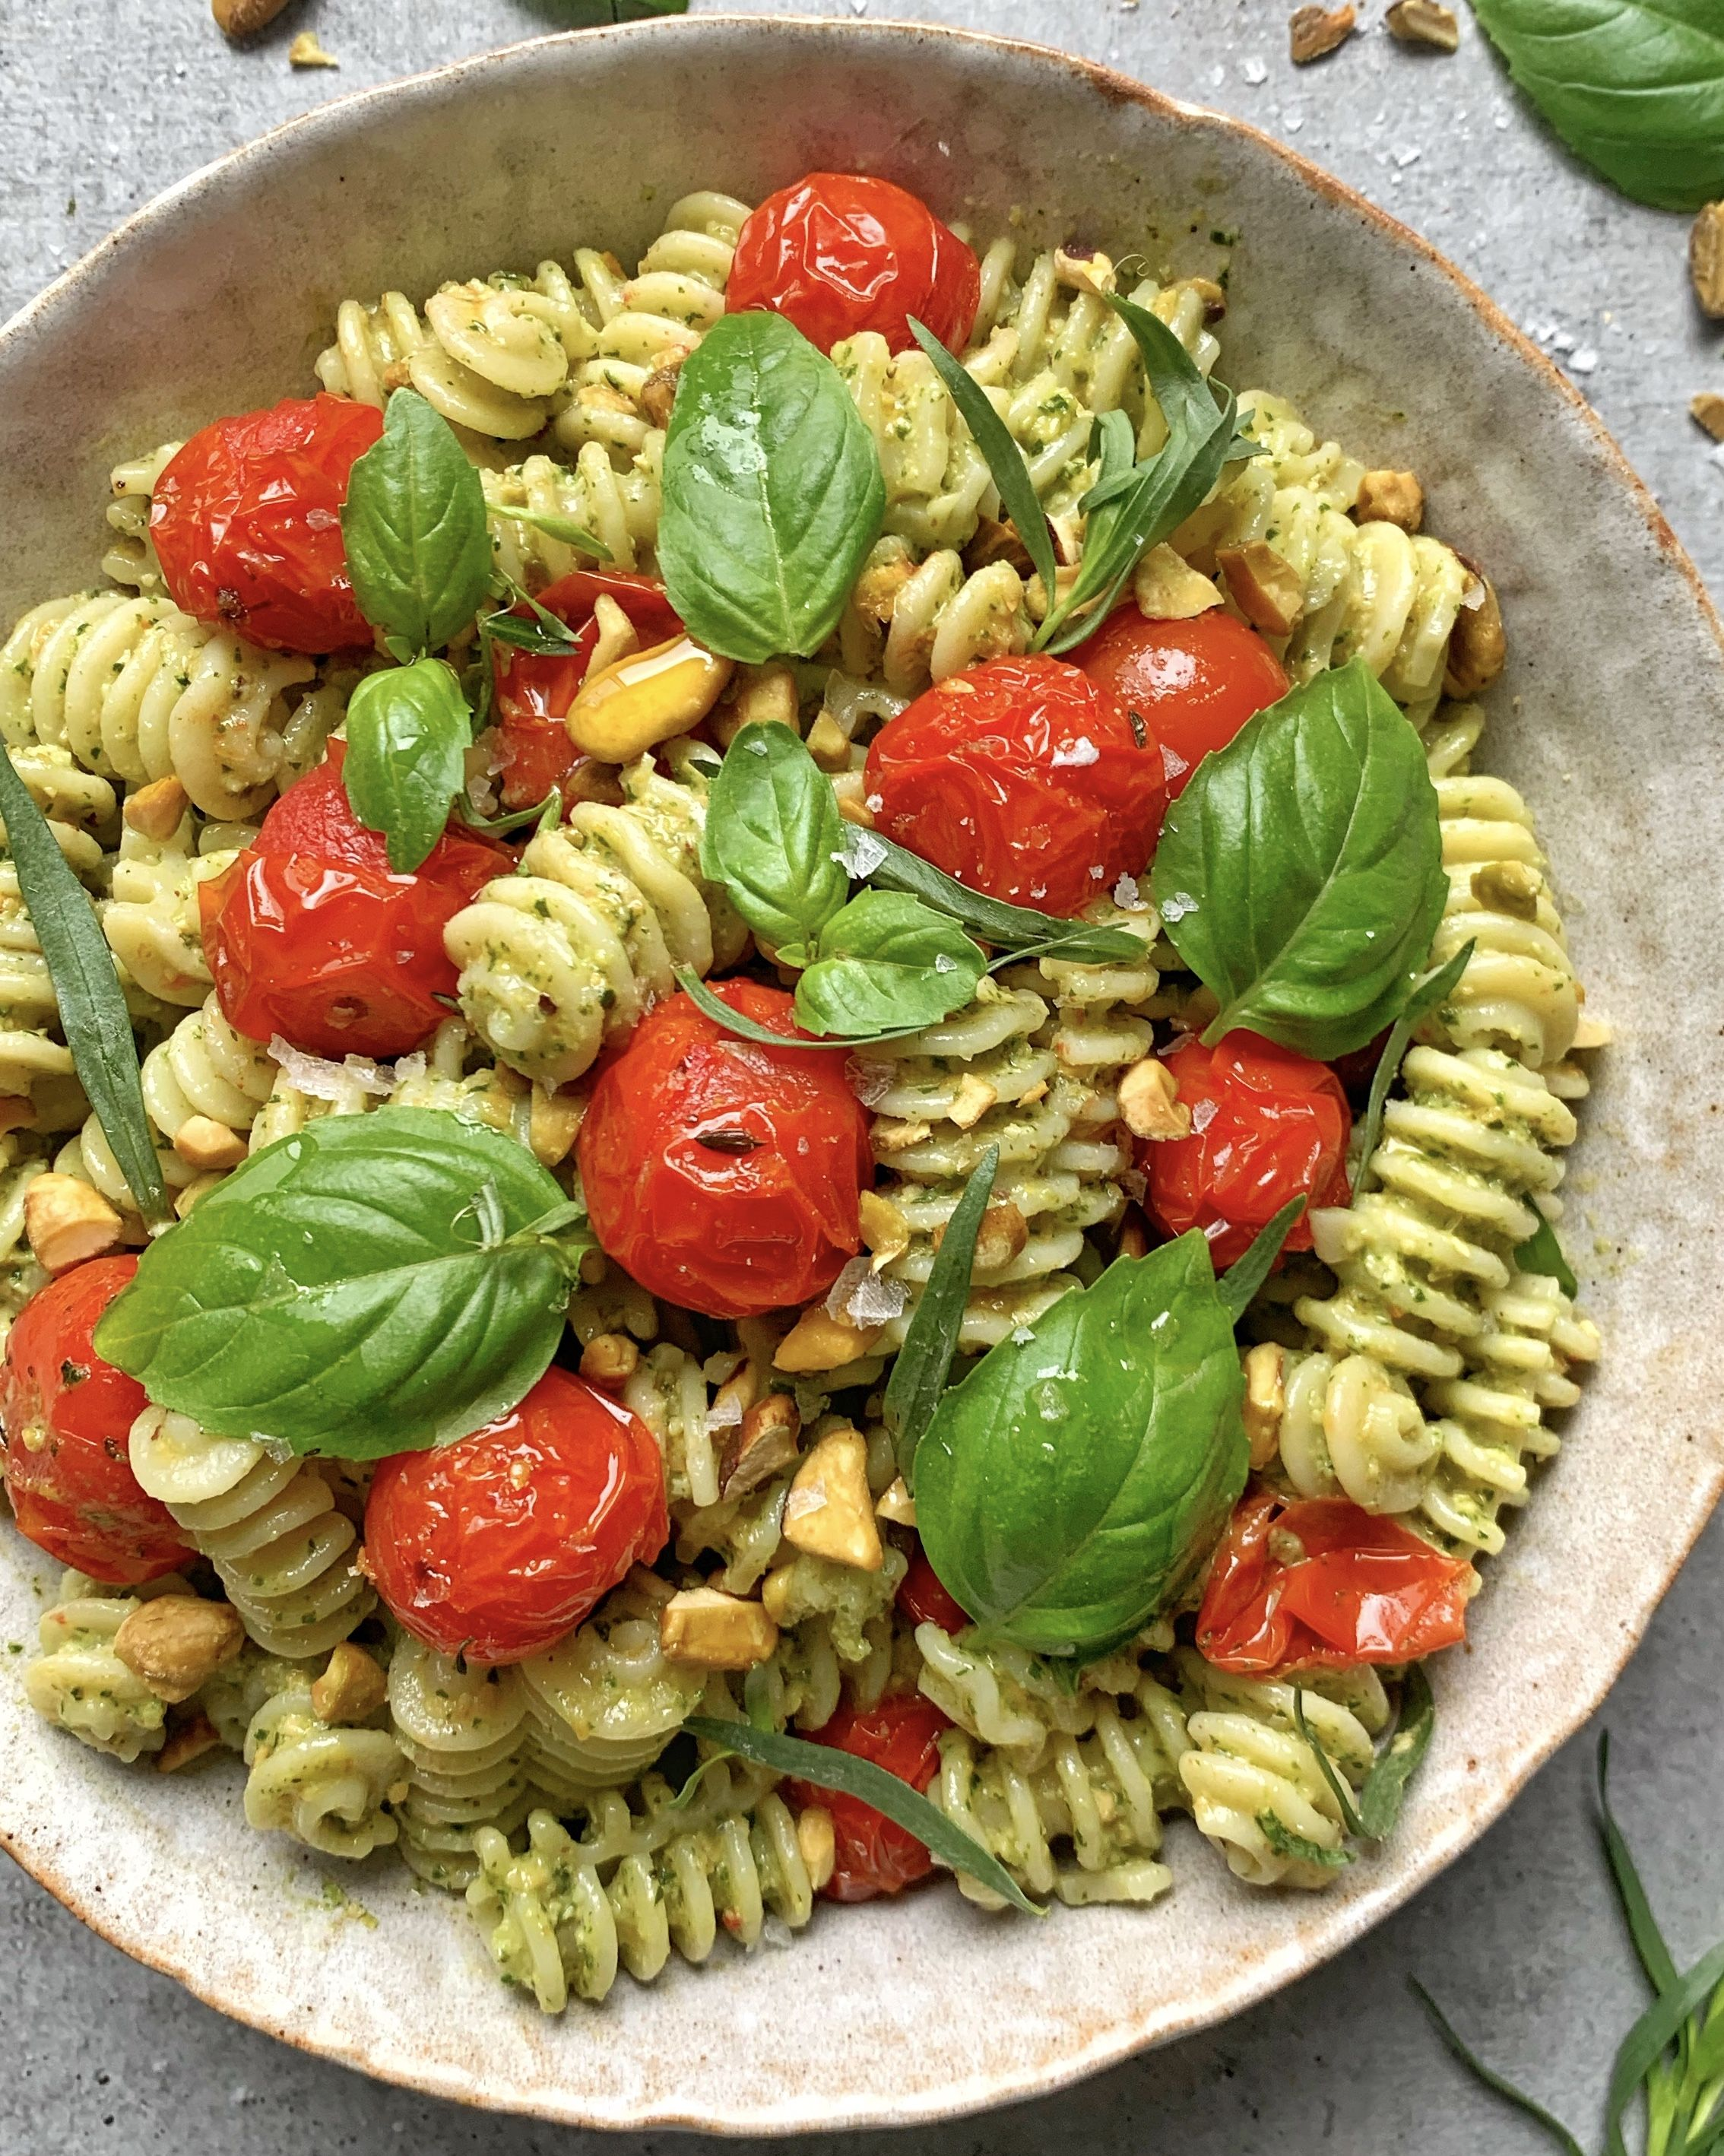 Roasted Tomato and Pistachio Pesto Pasta Salad